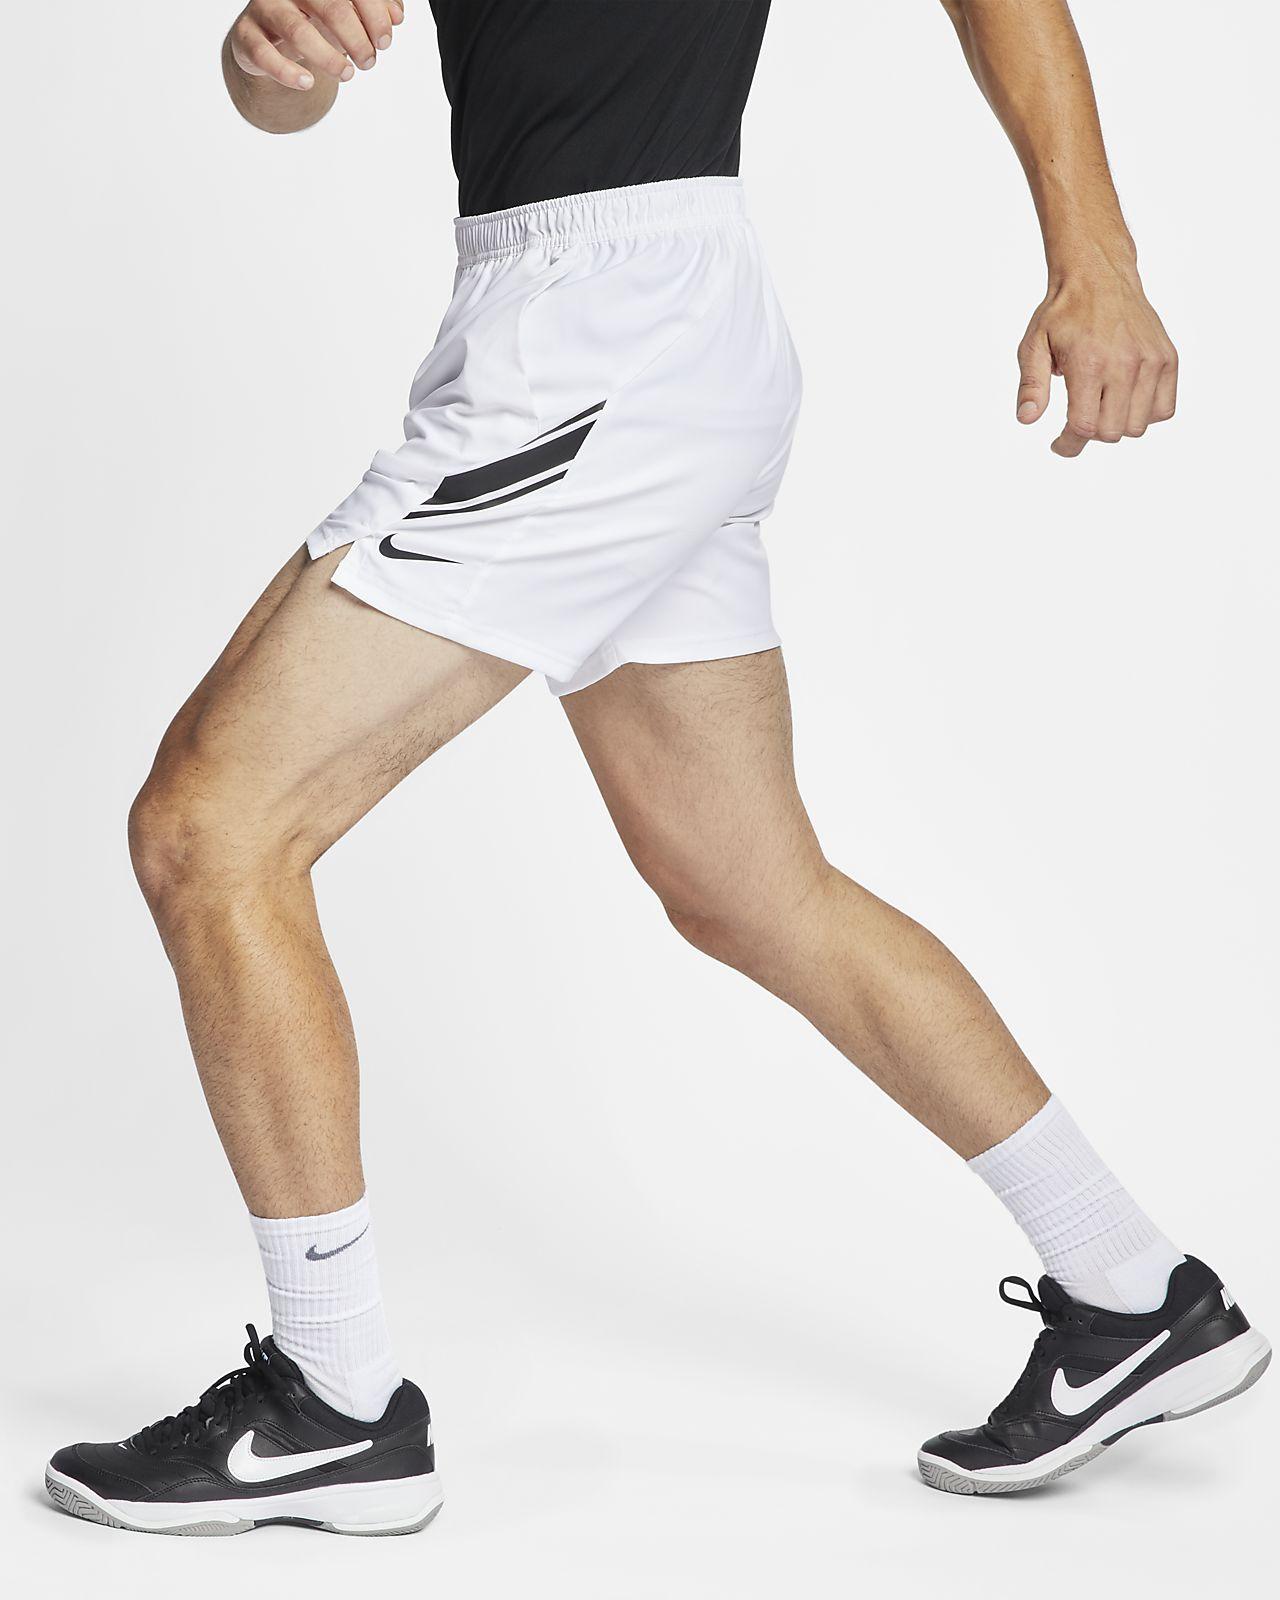 NikeCourt Dri-FIT Men's Tennis Shorts